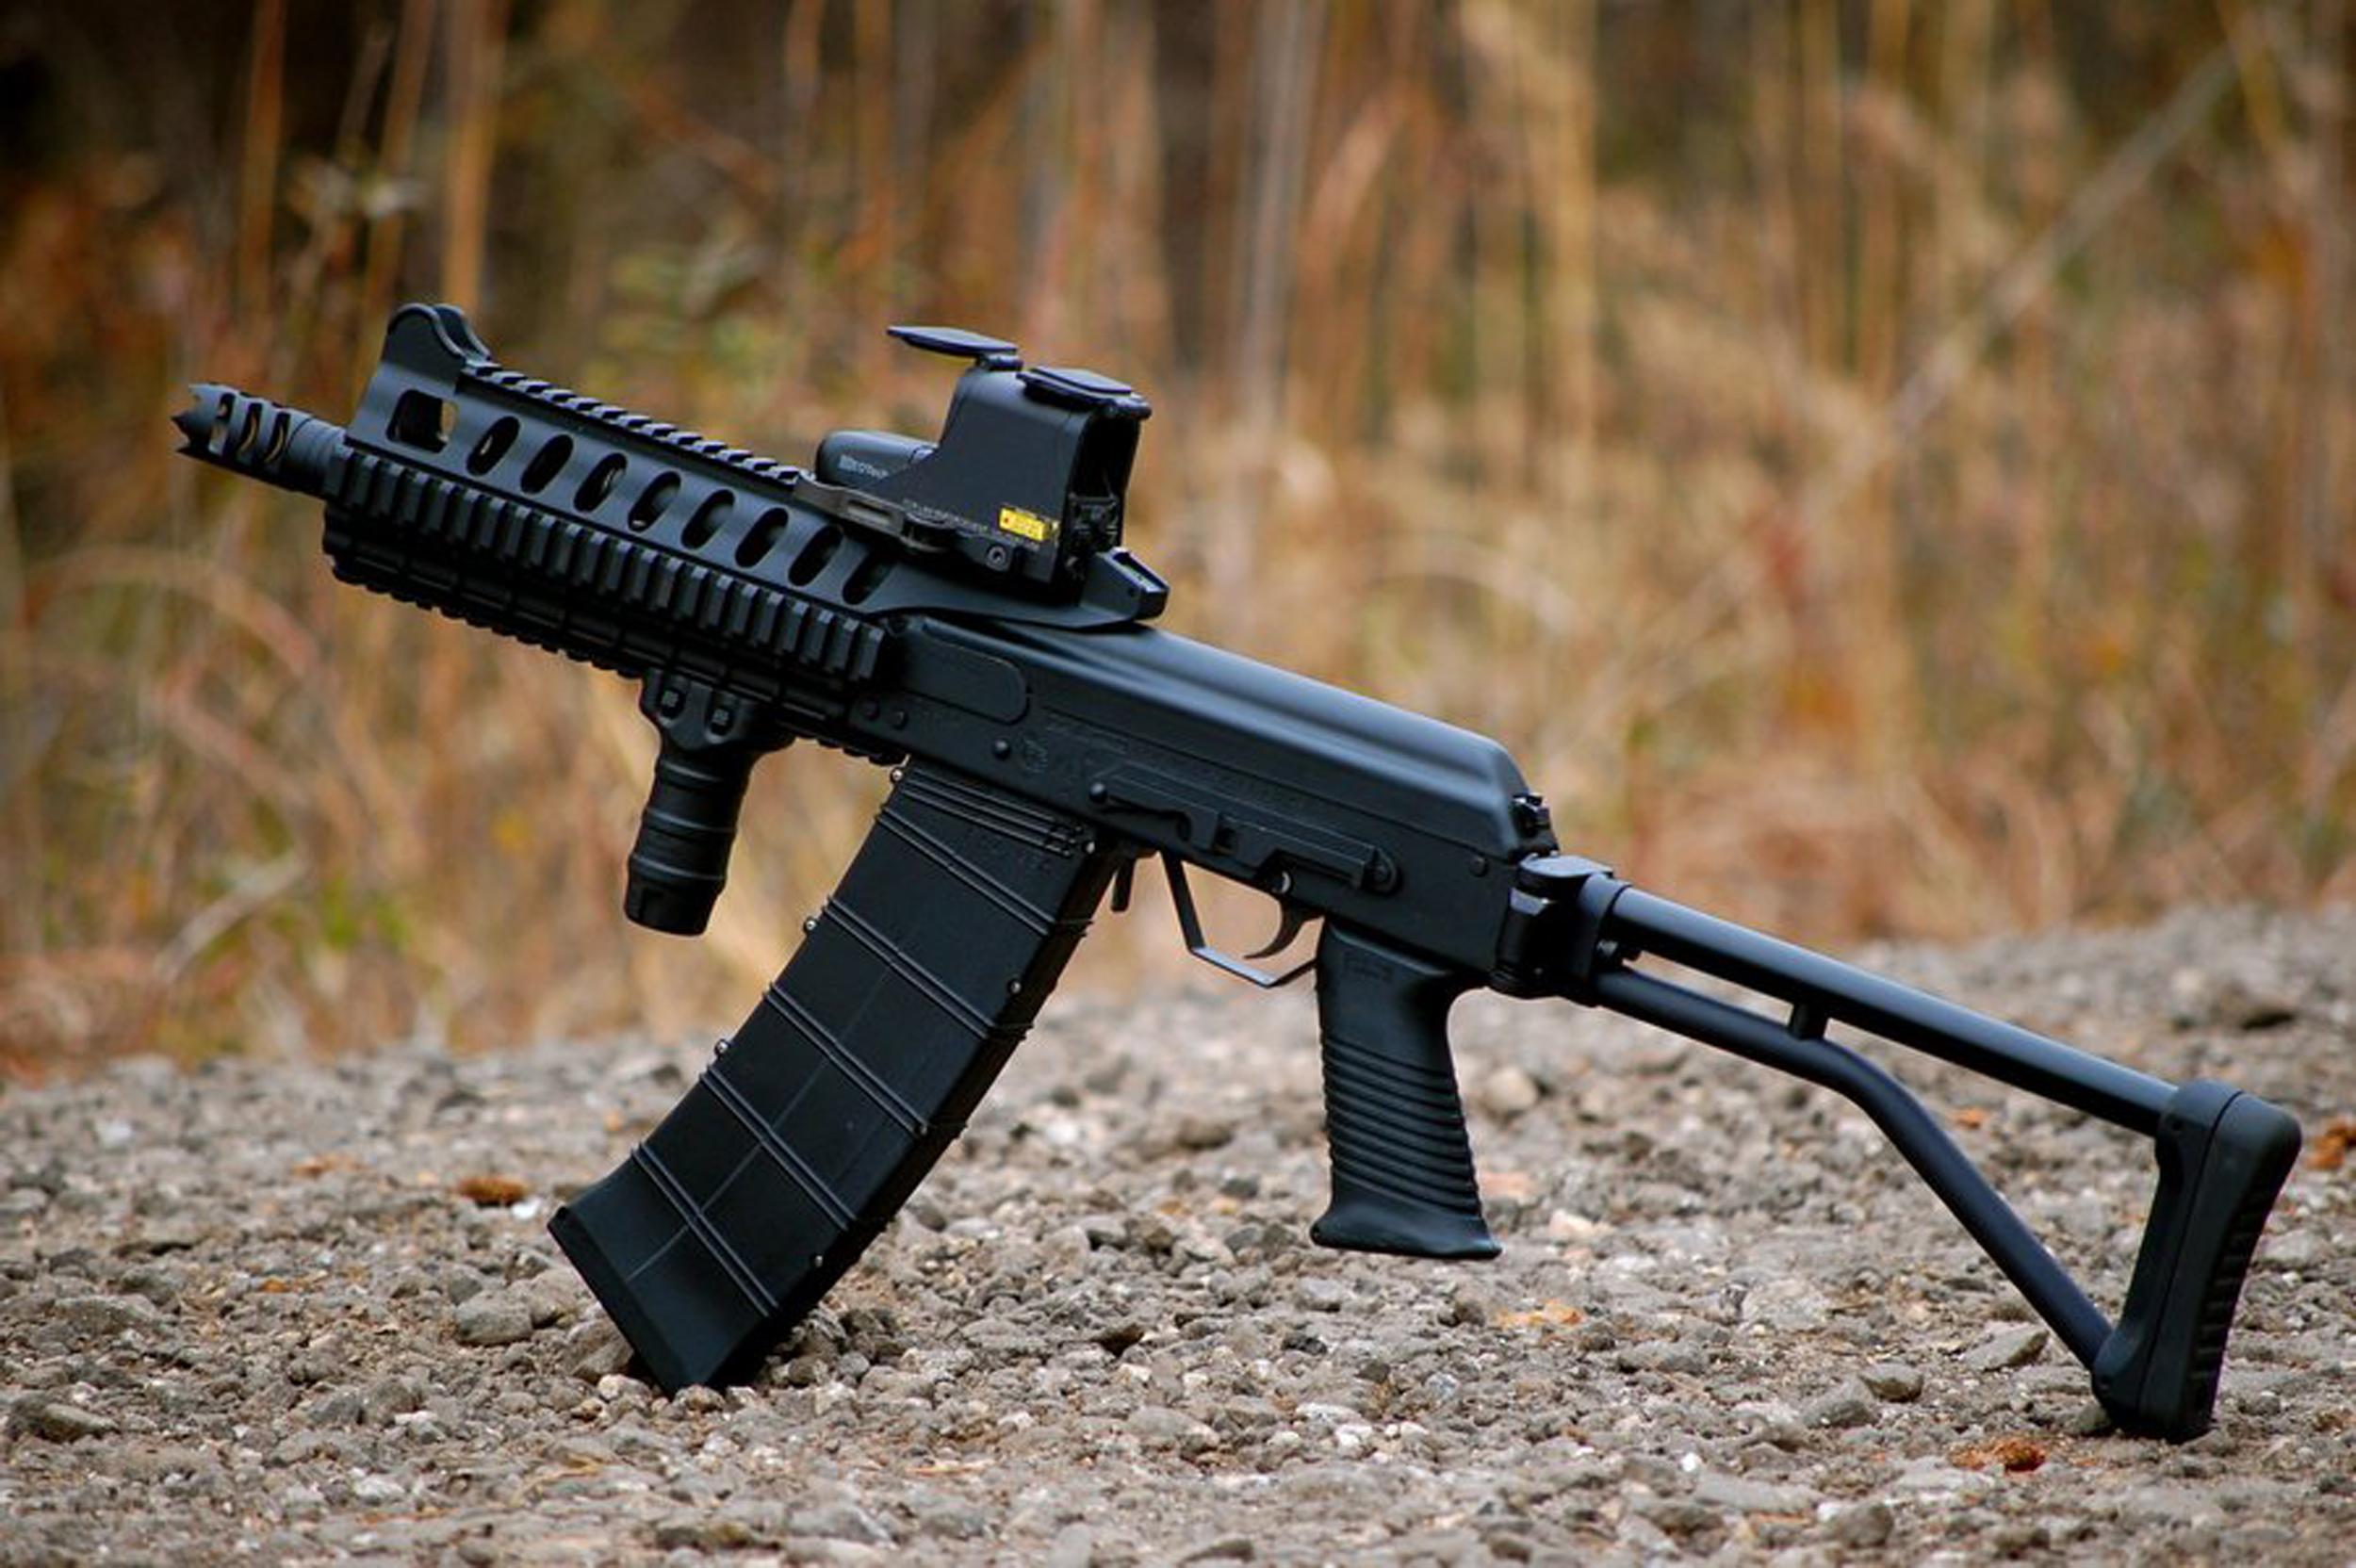 Senapan ini dilengkapi dengan popor lipat dengan bantalan peredam getaran yang membantu mengontrol hentakan kuat senapan 12 gauge.